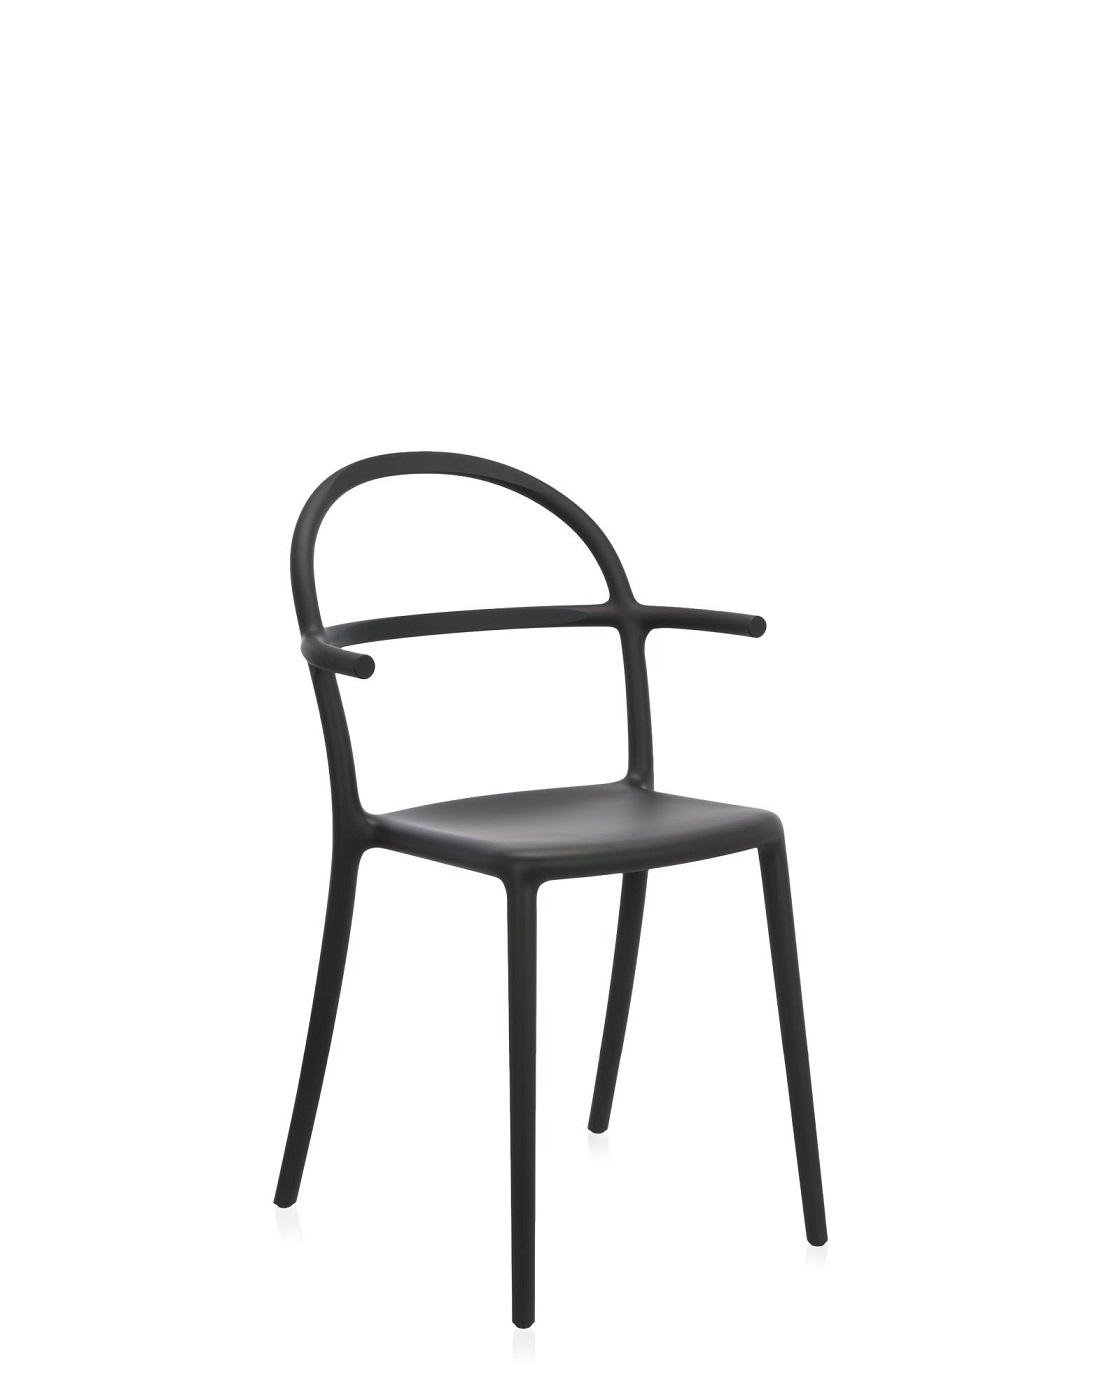 Sedia generic c kartell nera newformsdesign sedie for Sedia design kartell